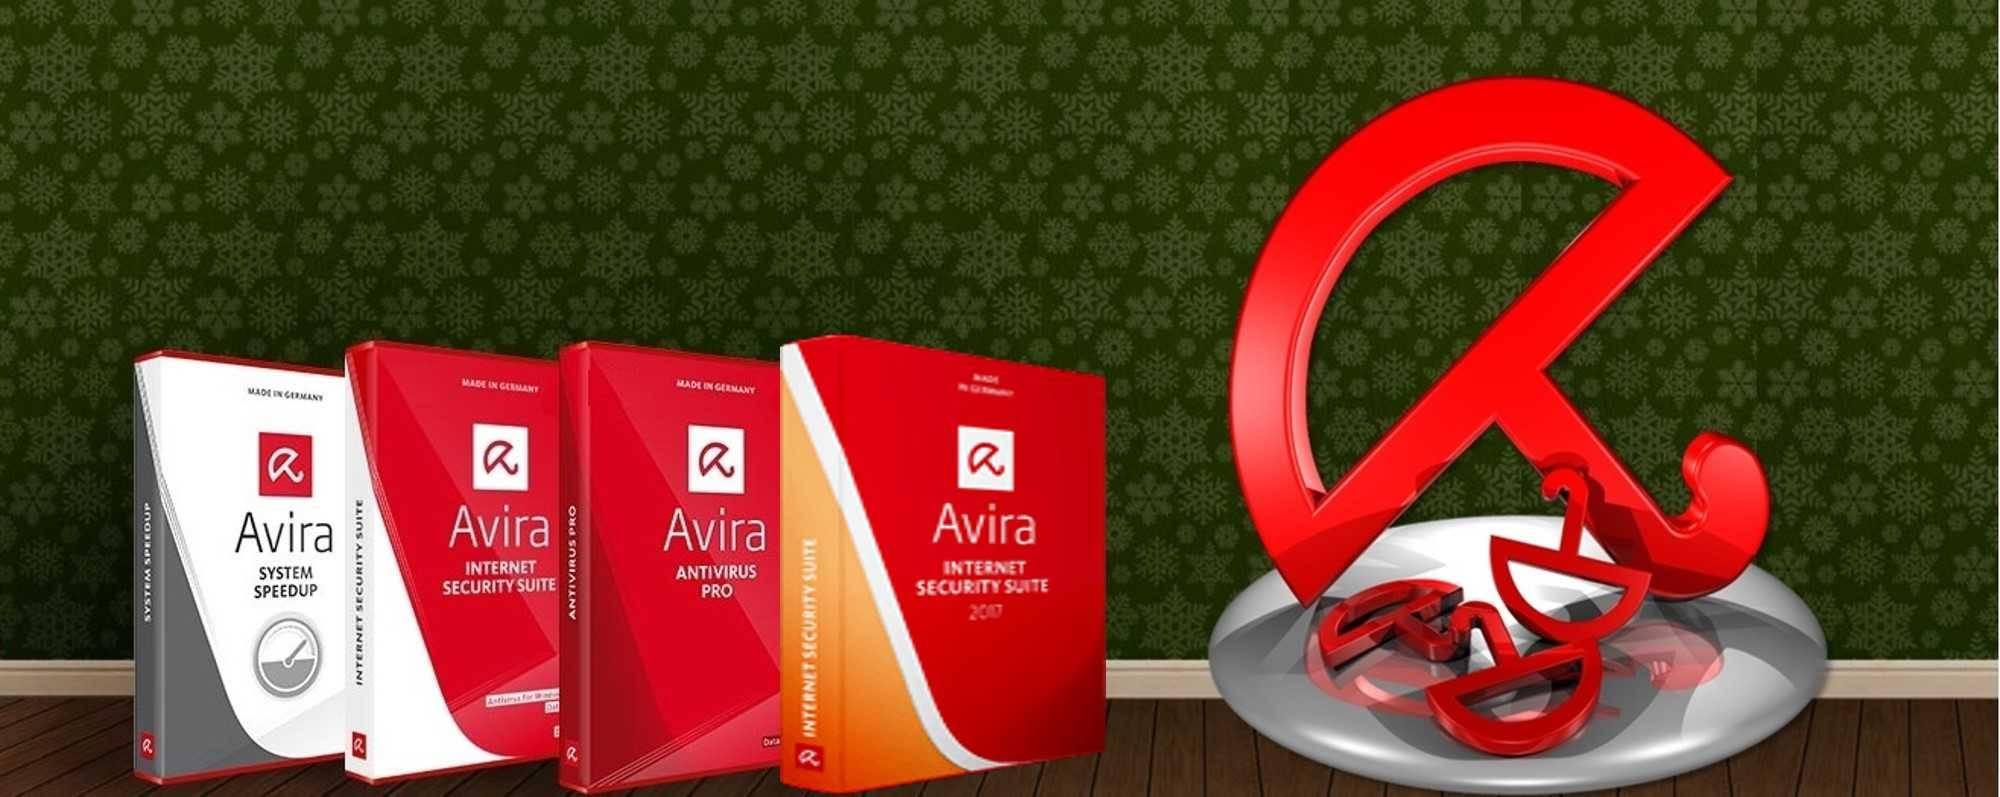 تحميل برنامج Avira Free Antivirus